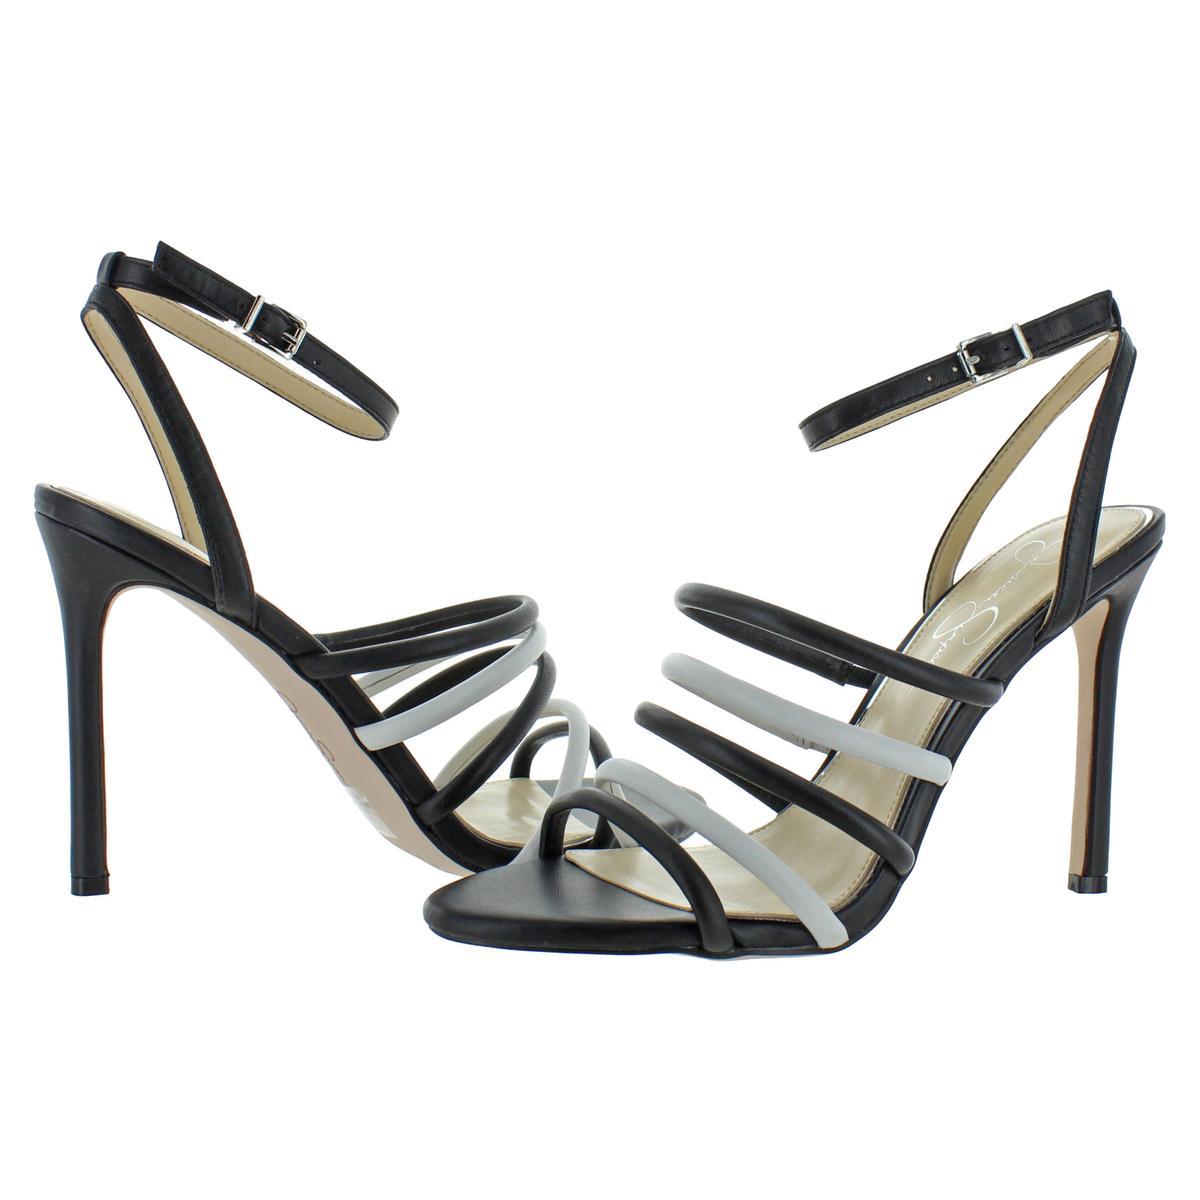 Jessica-Simpson-Femme-Joselle-a-Lanieres-Talon-Haut-Robe-Sandales-Chaussures-BHFO-7879 miniature 6